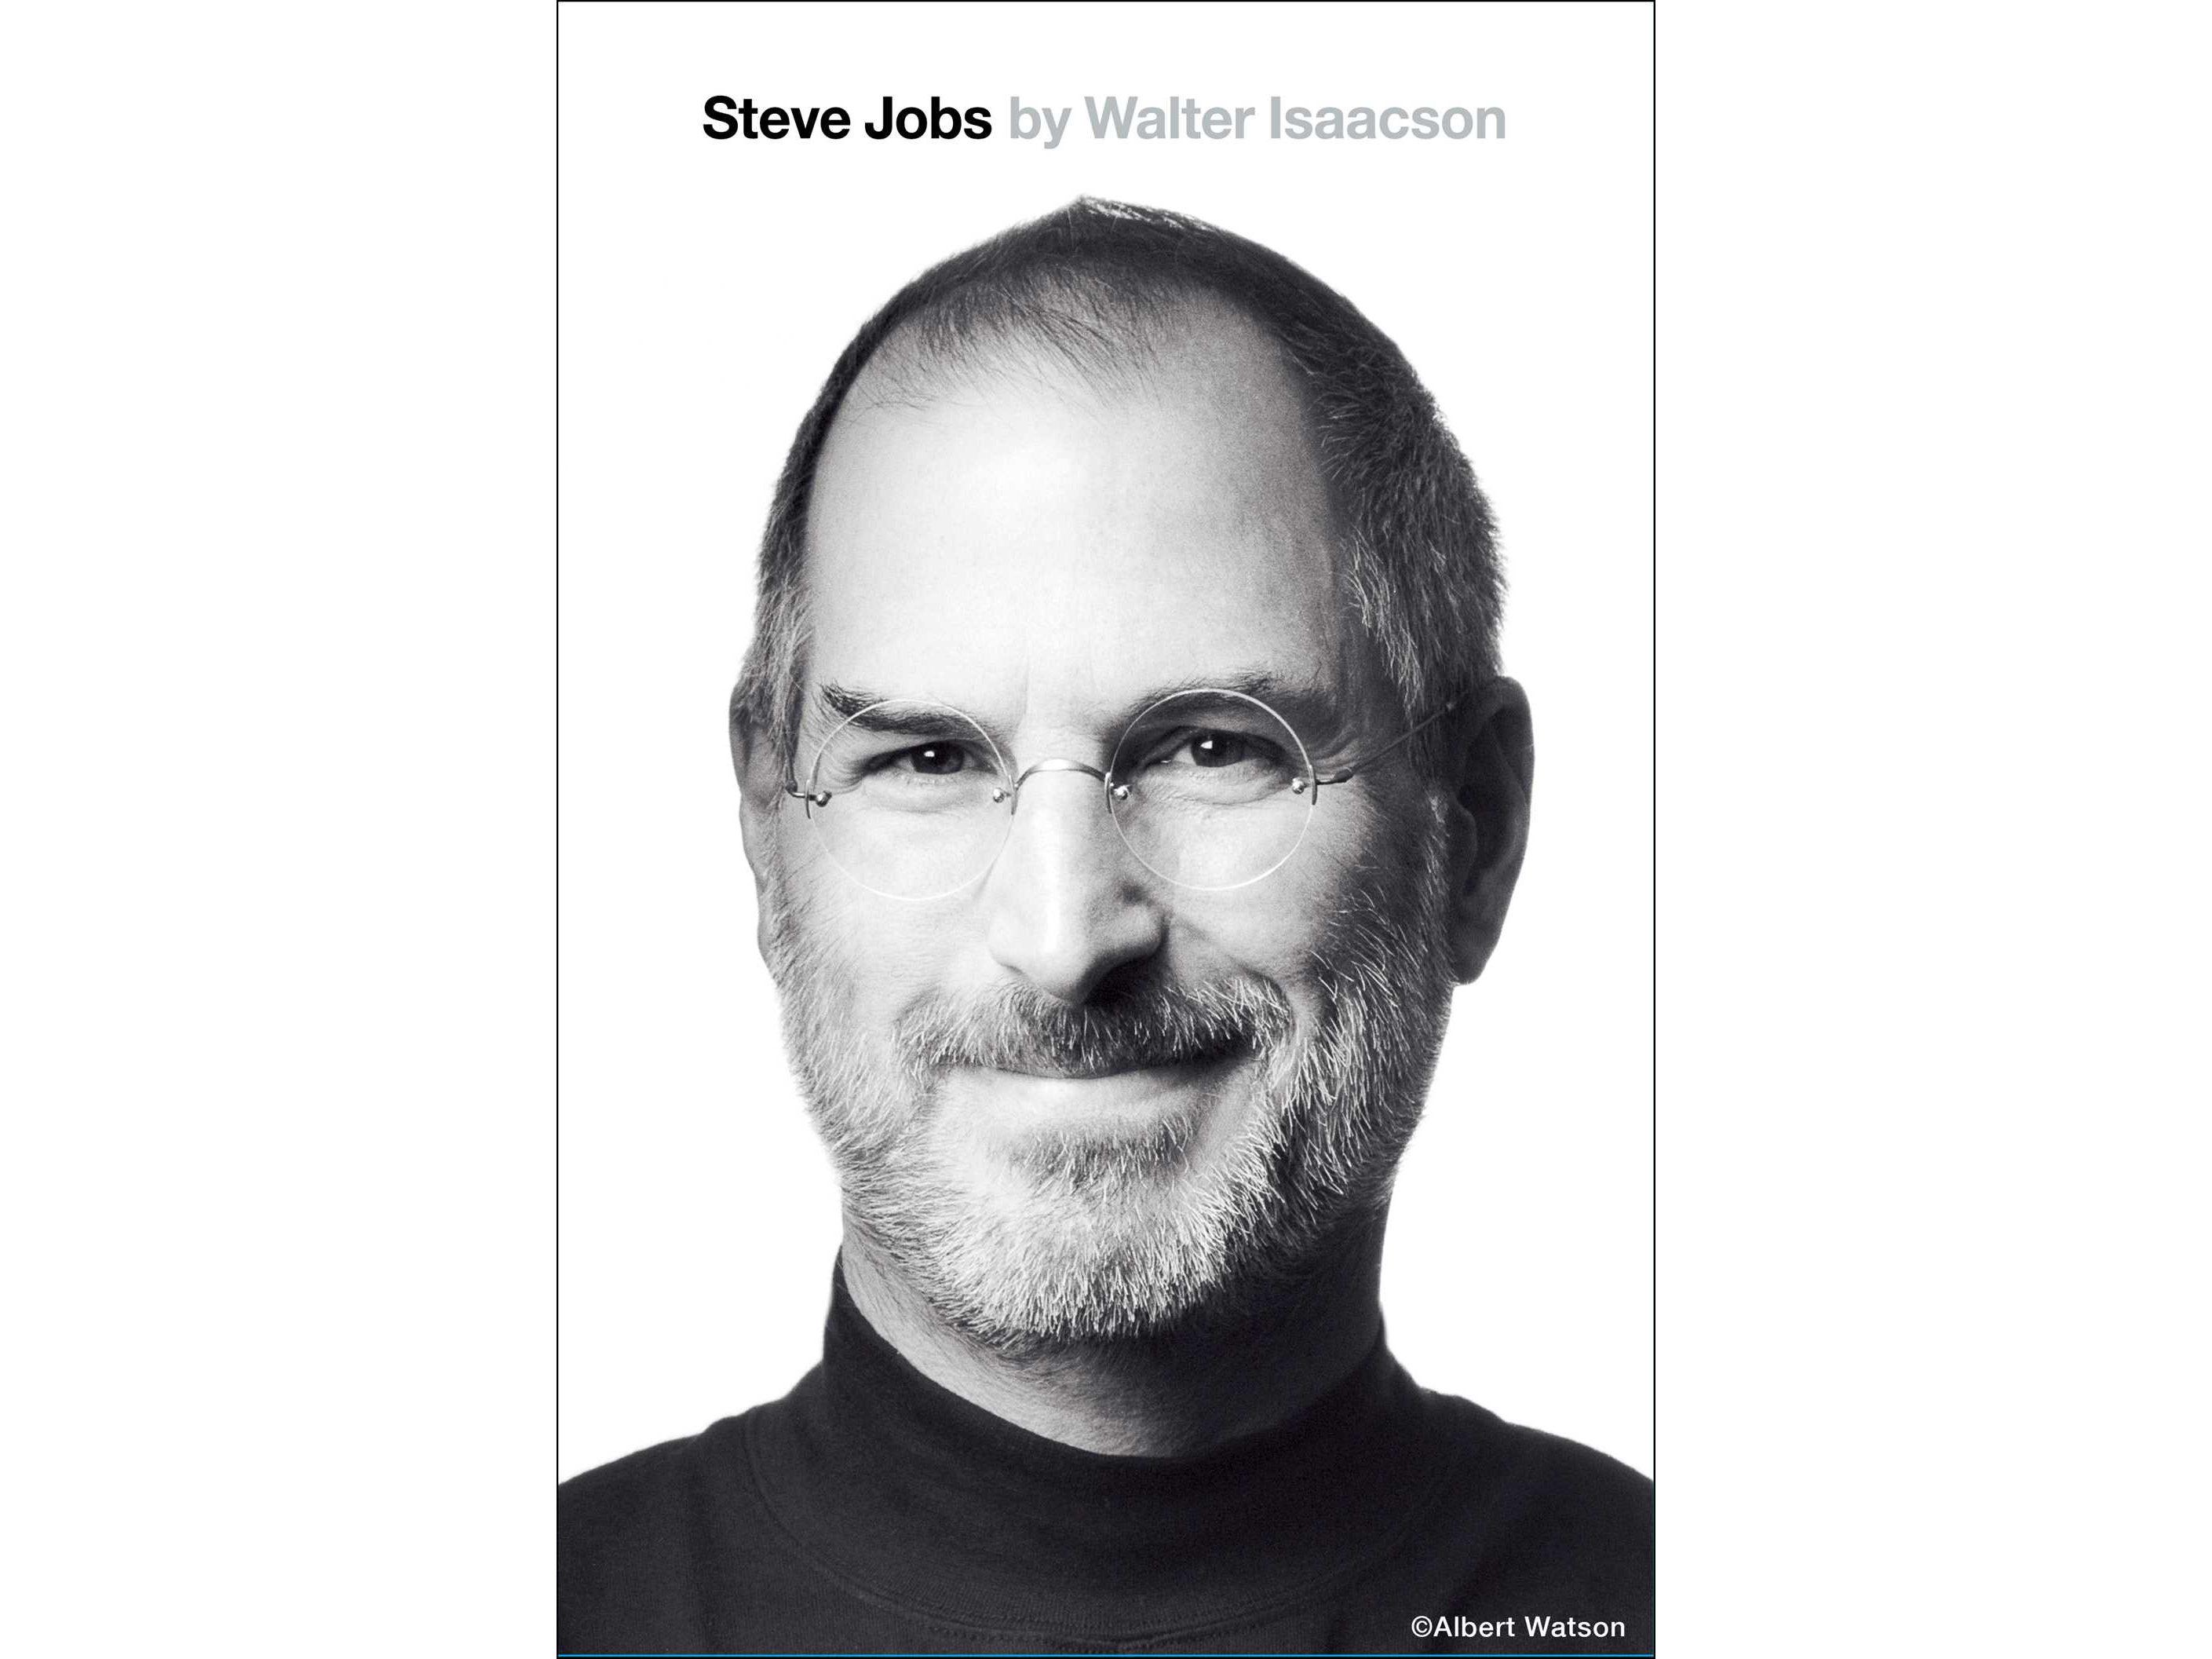 9. Steve Jobs: A Biography by Walter Isaacson